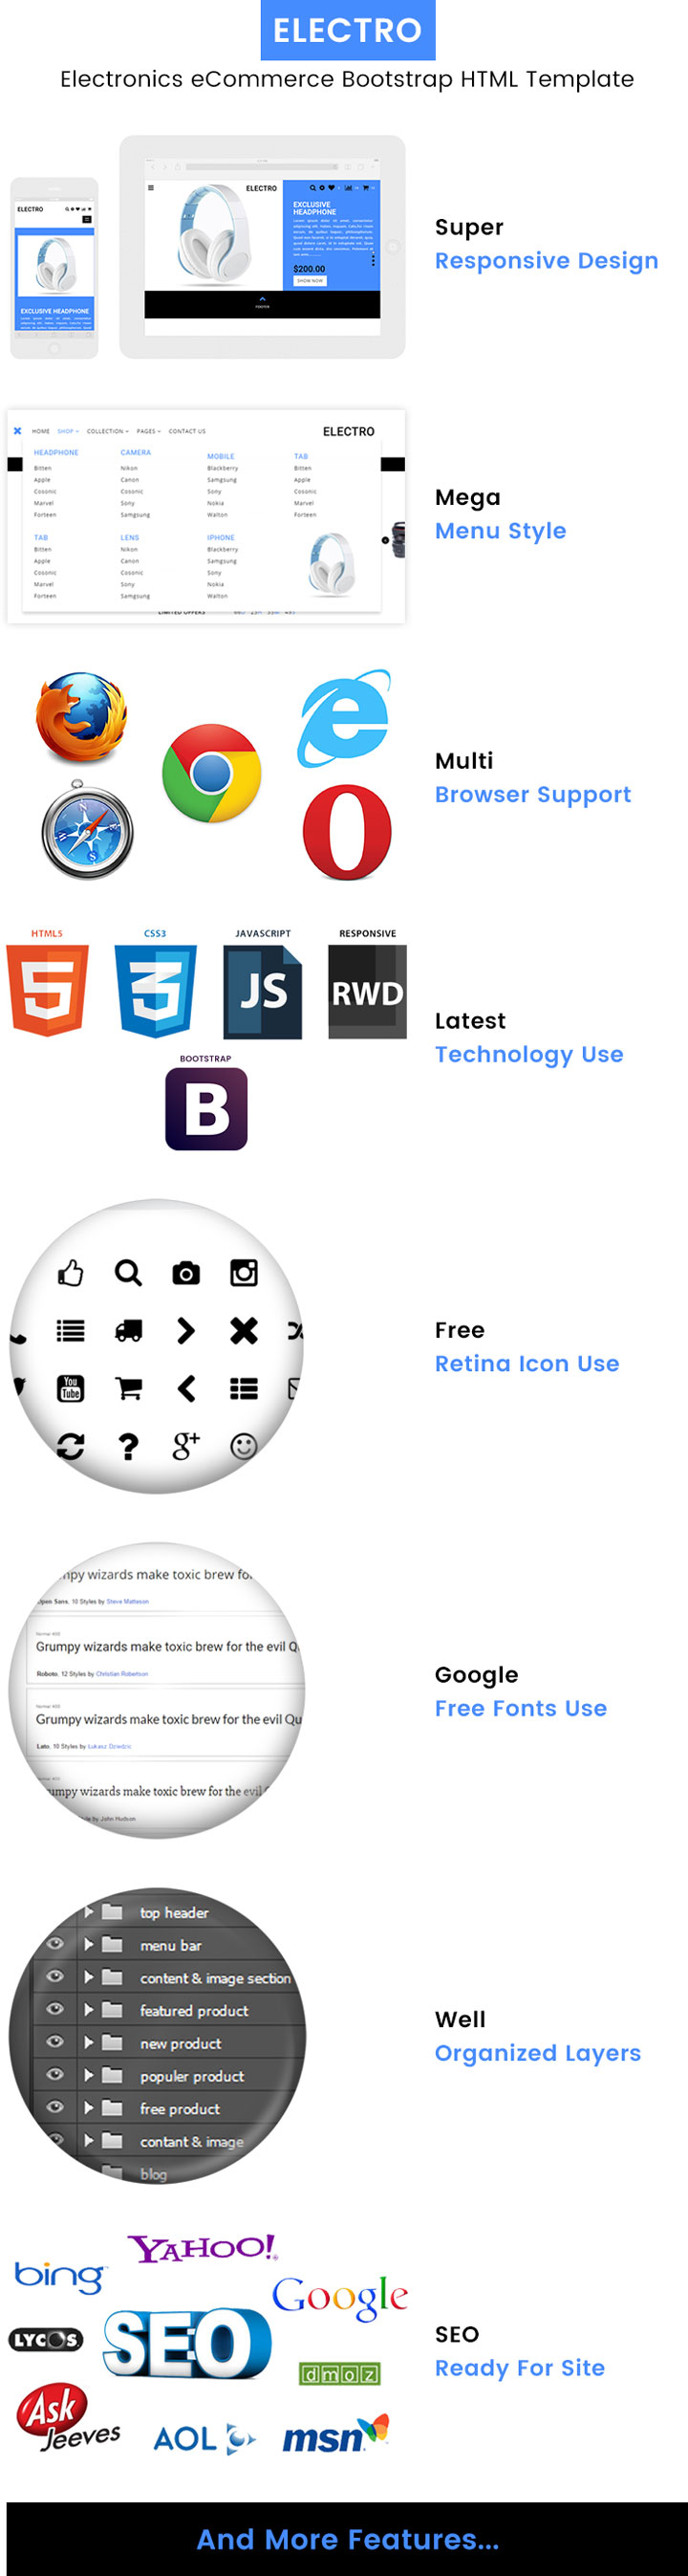 themetidy-Electro-Electronics-eCommerce-Bootstrap-HTML-Template-description-feature-list-image